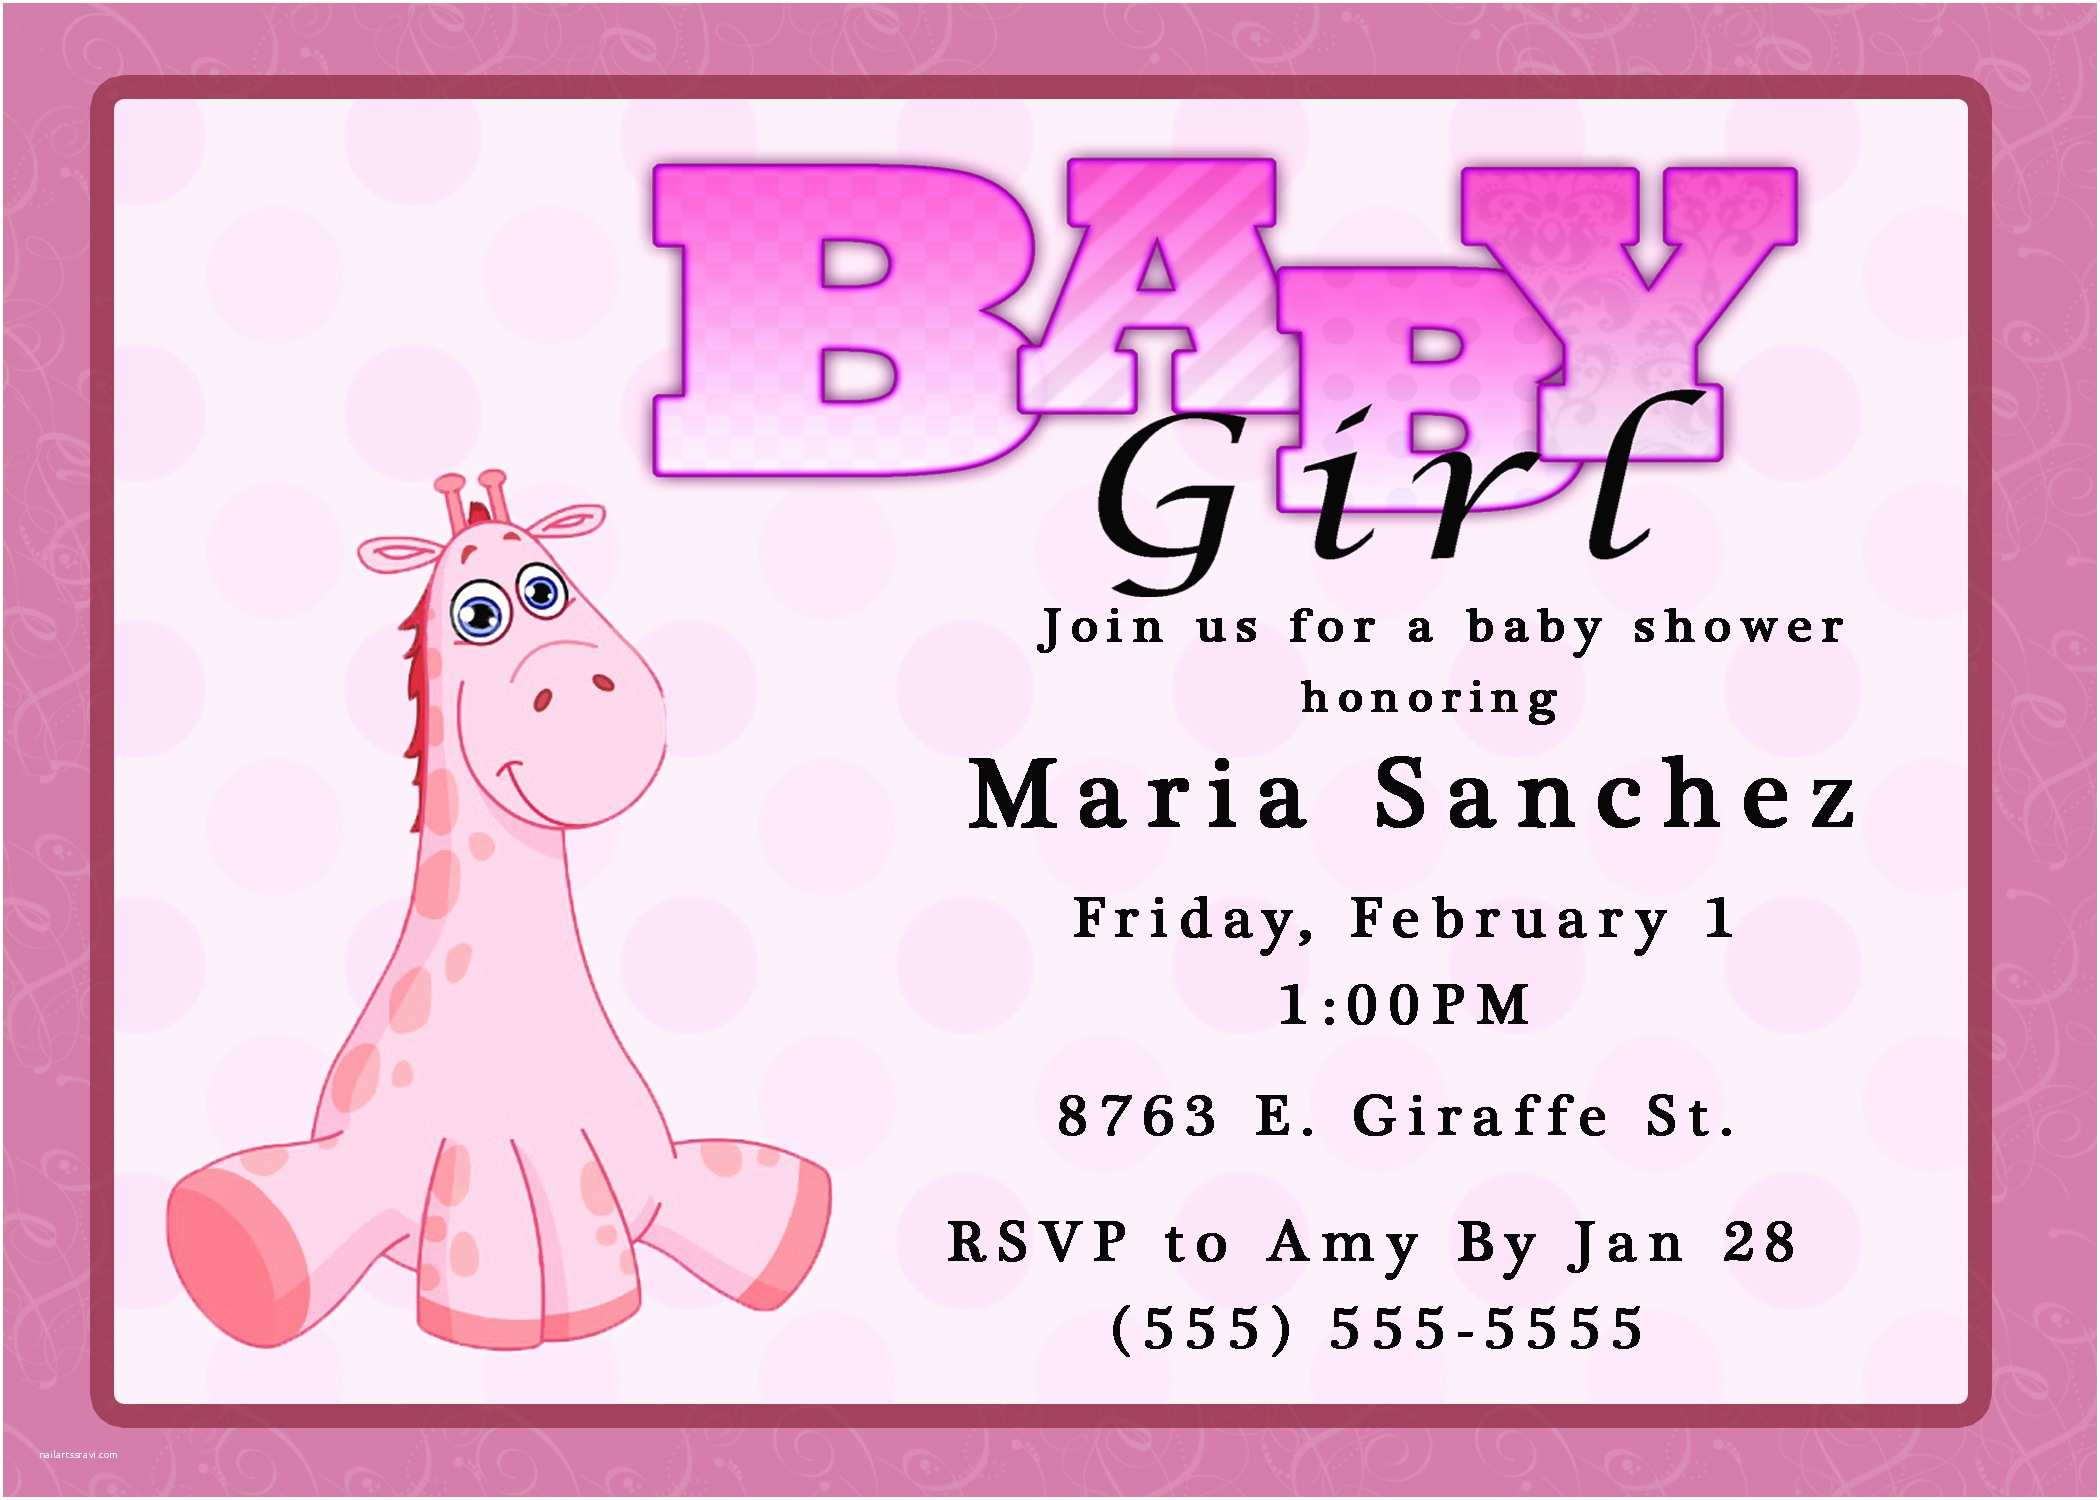 Cheap Baby Shower Invitations Girl Girl Baby Shower Invitations Discount — Anouk Invitations